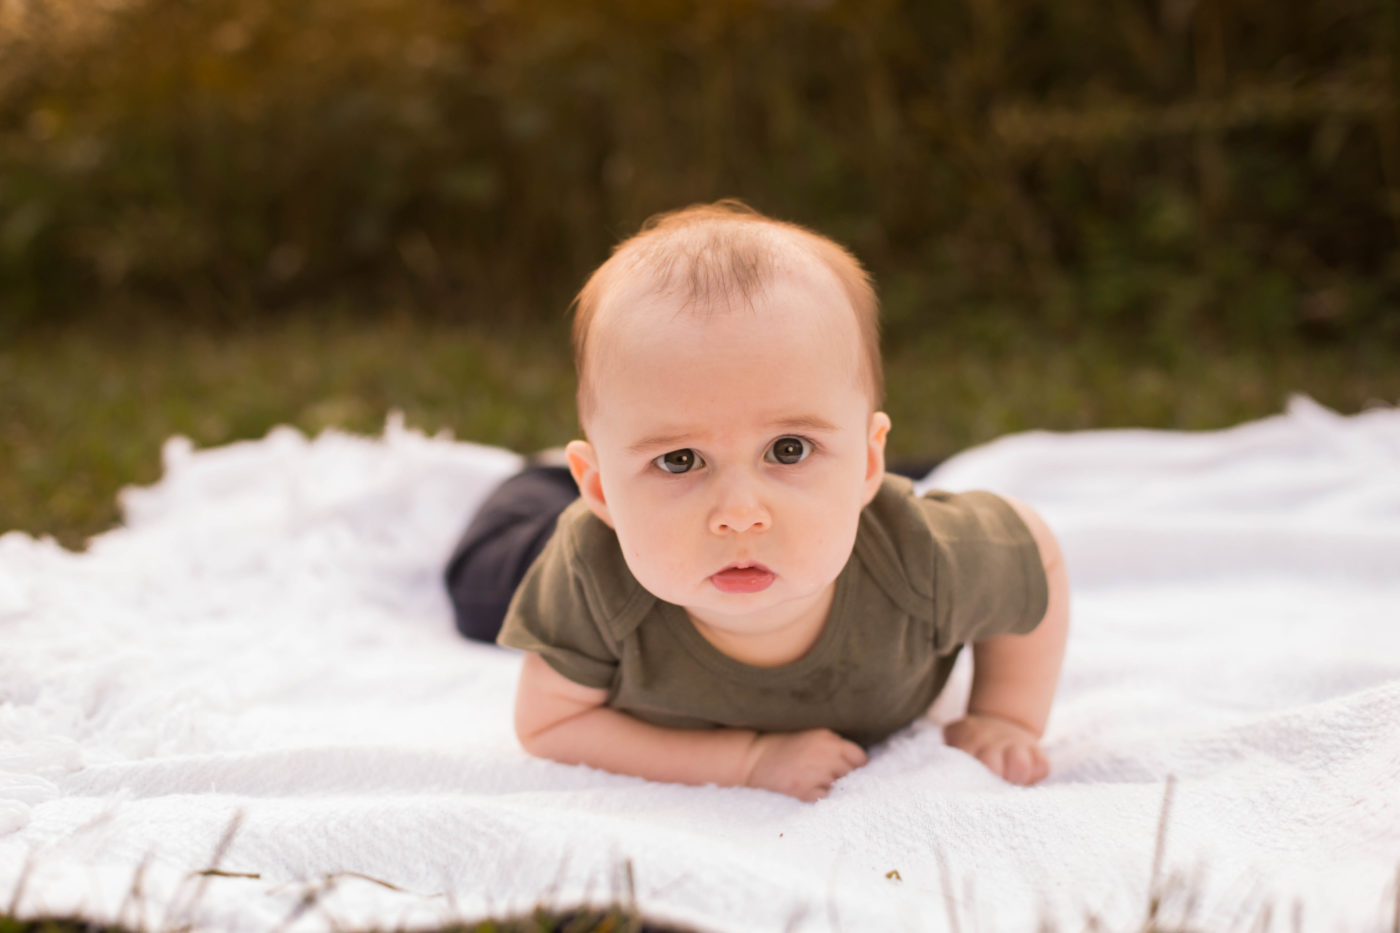 minisession2_winnetka_child_photography-1400x933.jpg